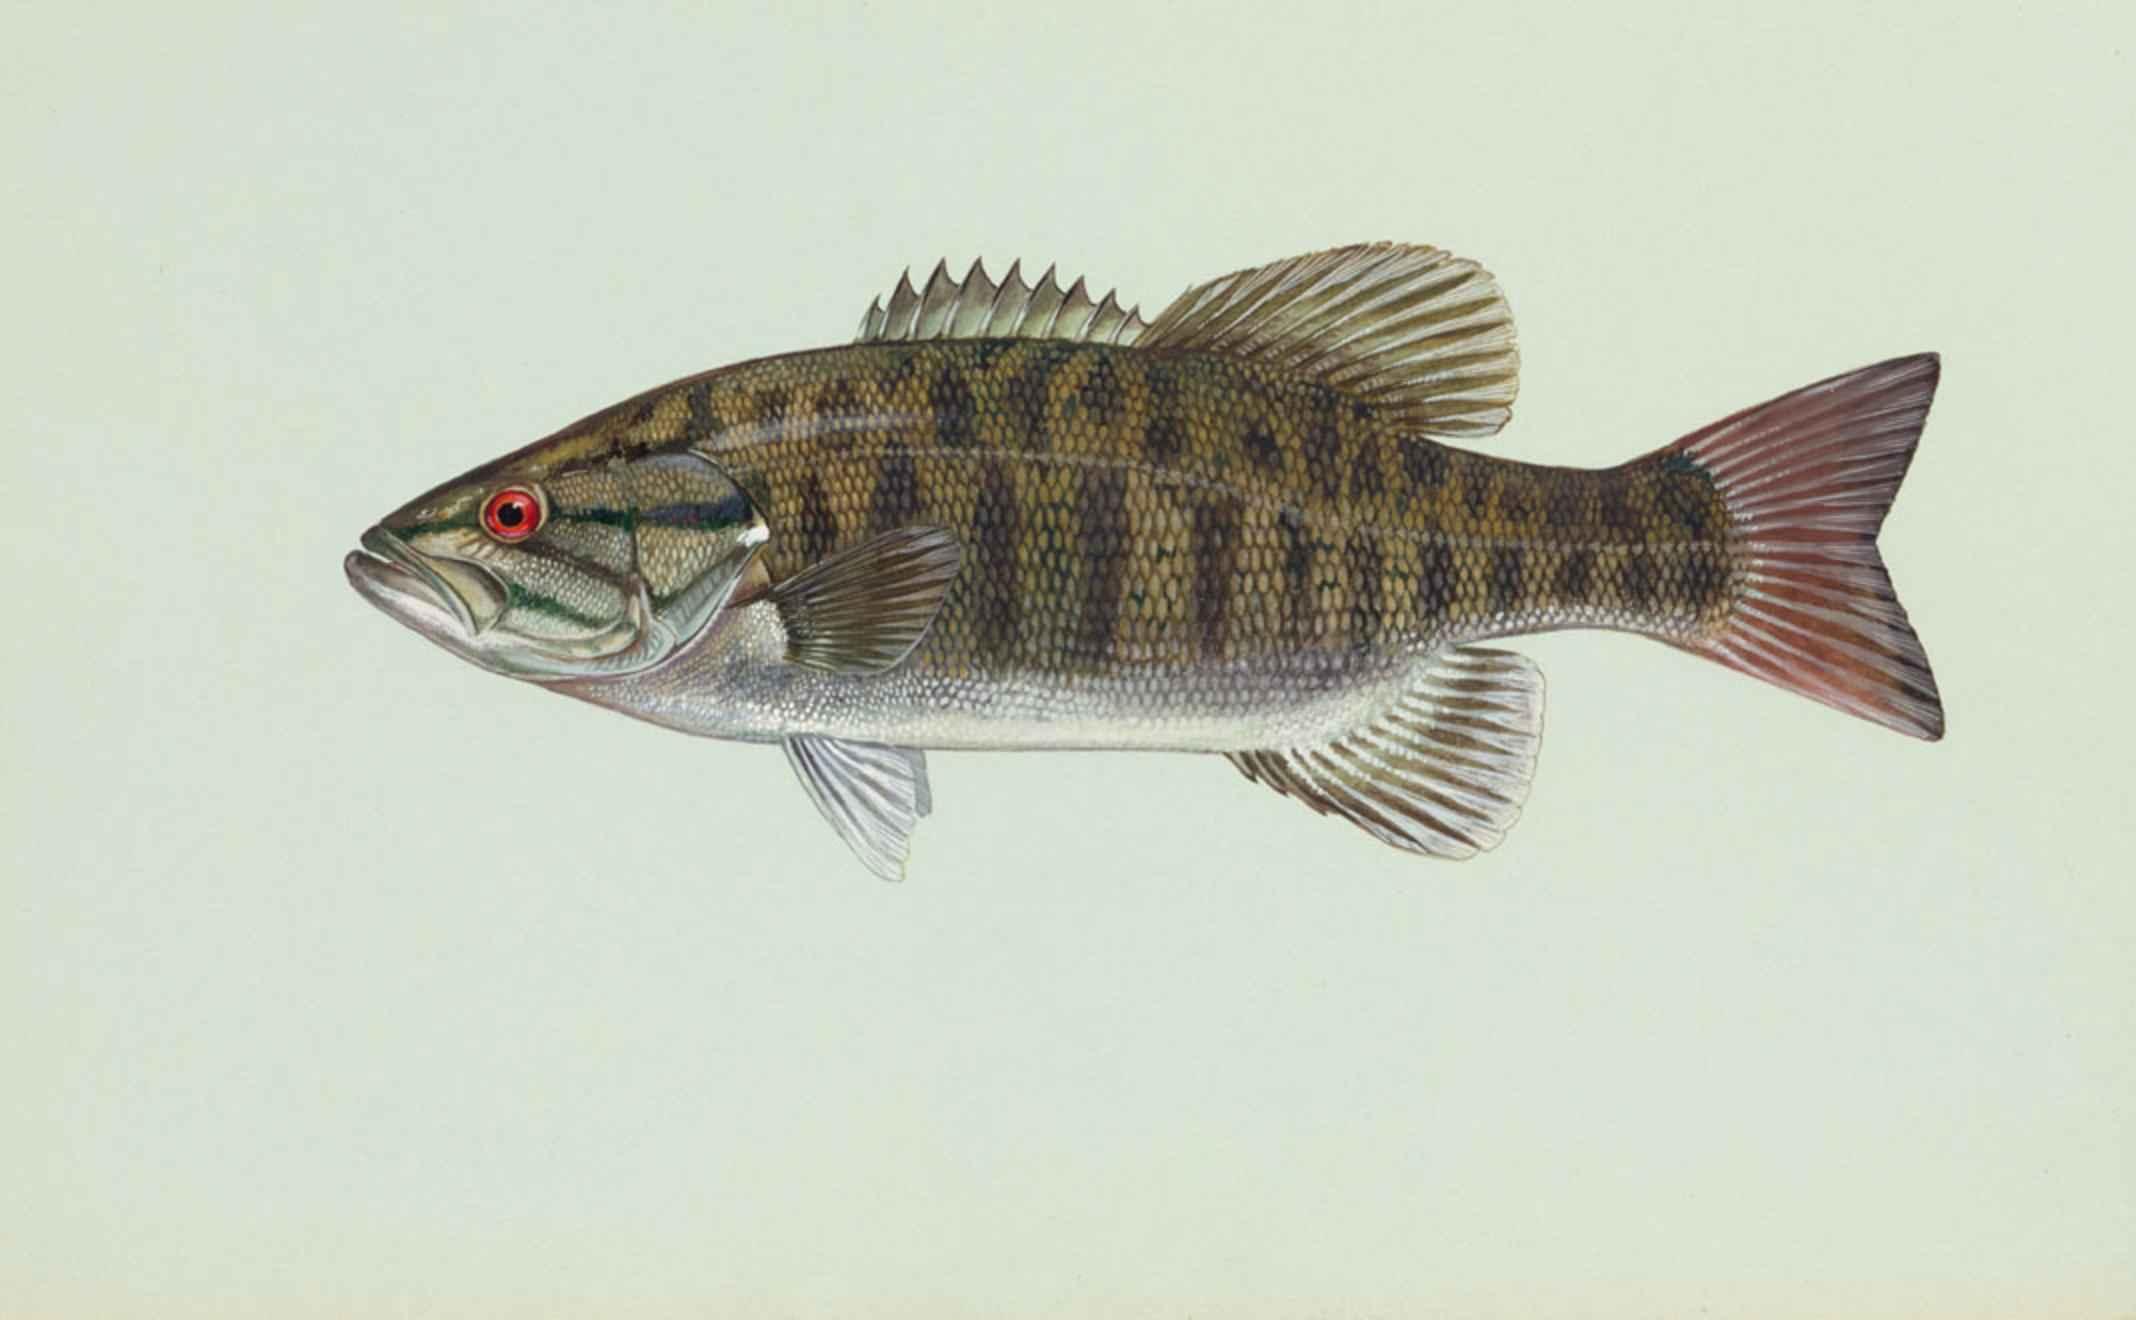 filemicropterus dolomieu smallmouth bass fishjpg